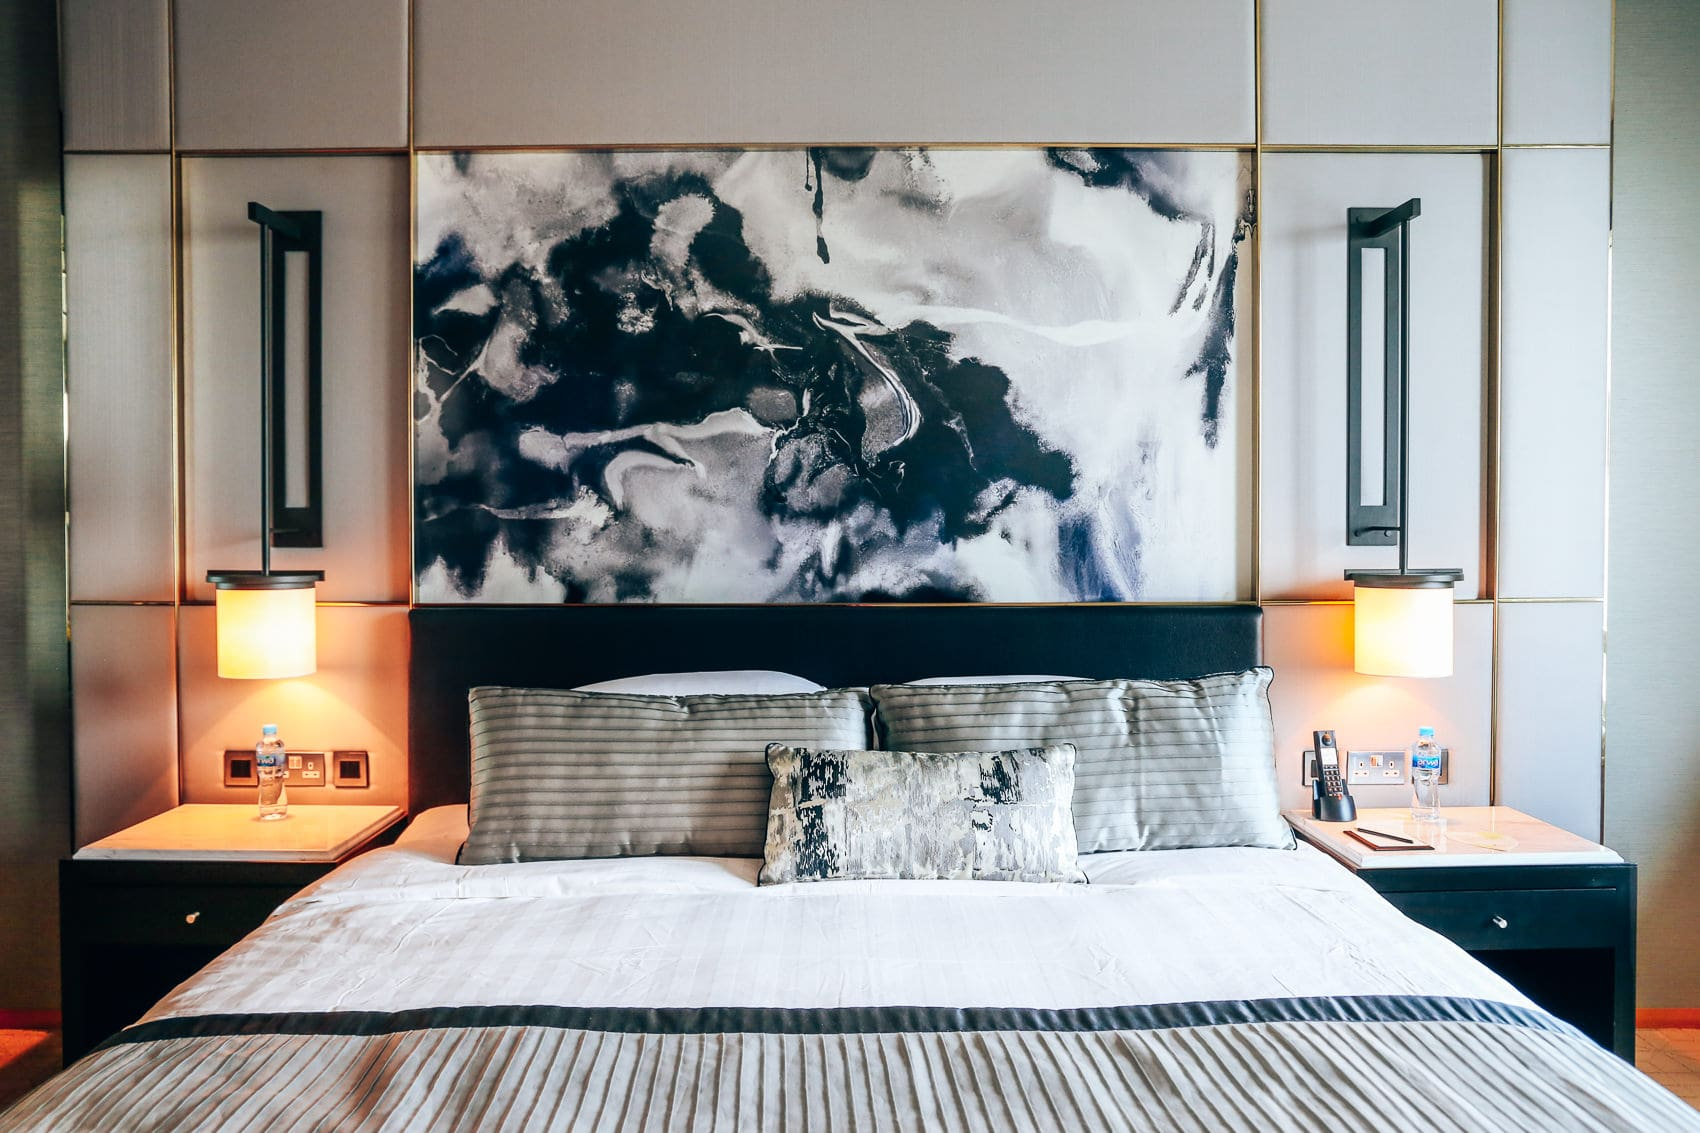 luxushotel-shangri-la-dubai-zimmer-pool-mit-blick-auf-den-burj-khalifa-reiseblog-des-belles-choses 15